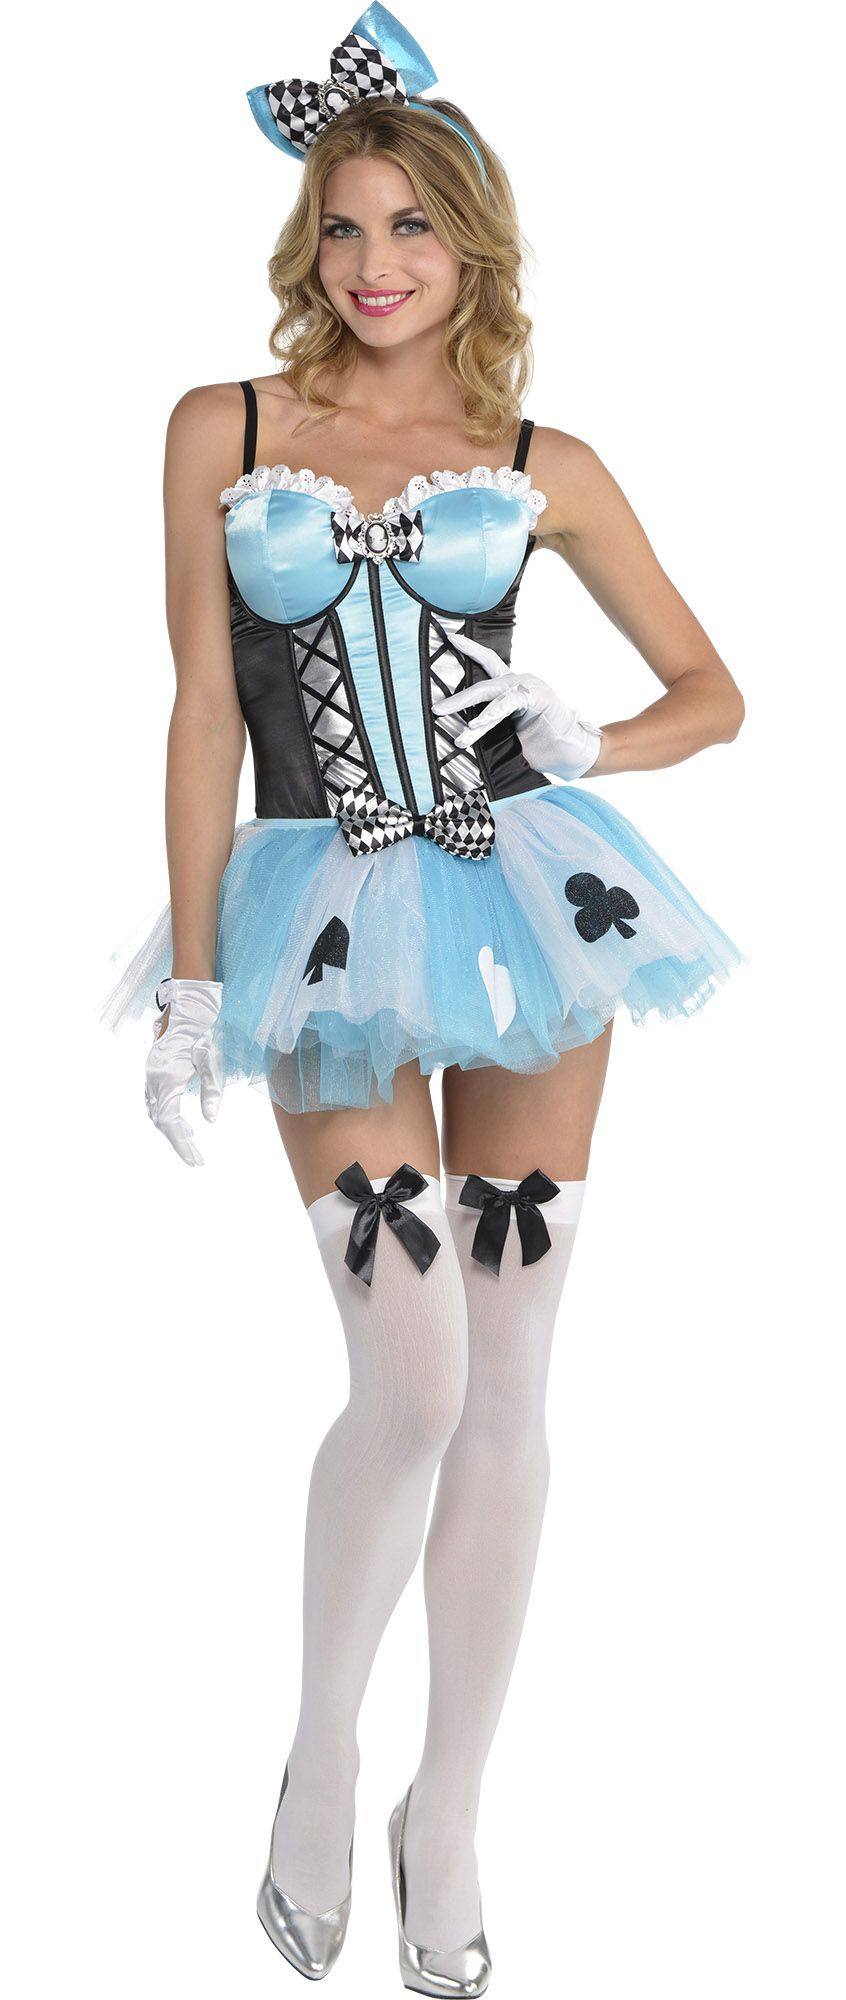 Create Your Own Look - Female Alice in Wonderland #1